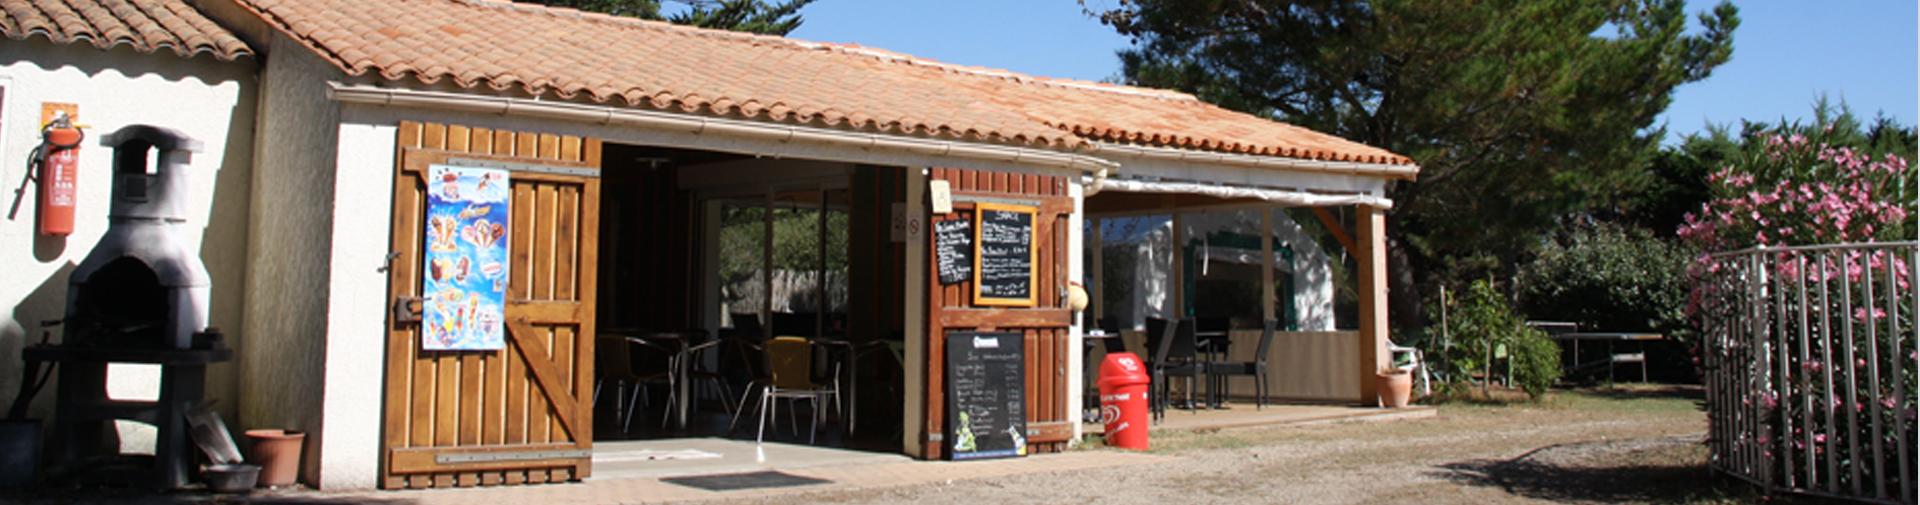 snack-bar-camping-la-campiere-ile-oleron